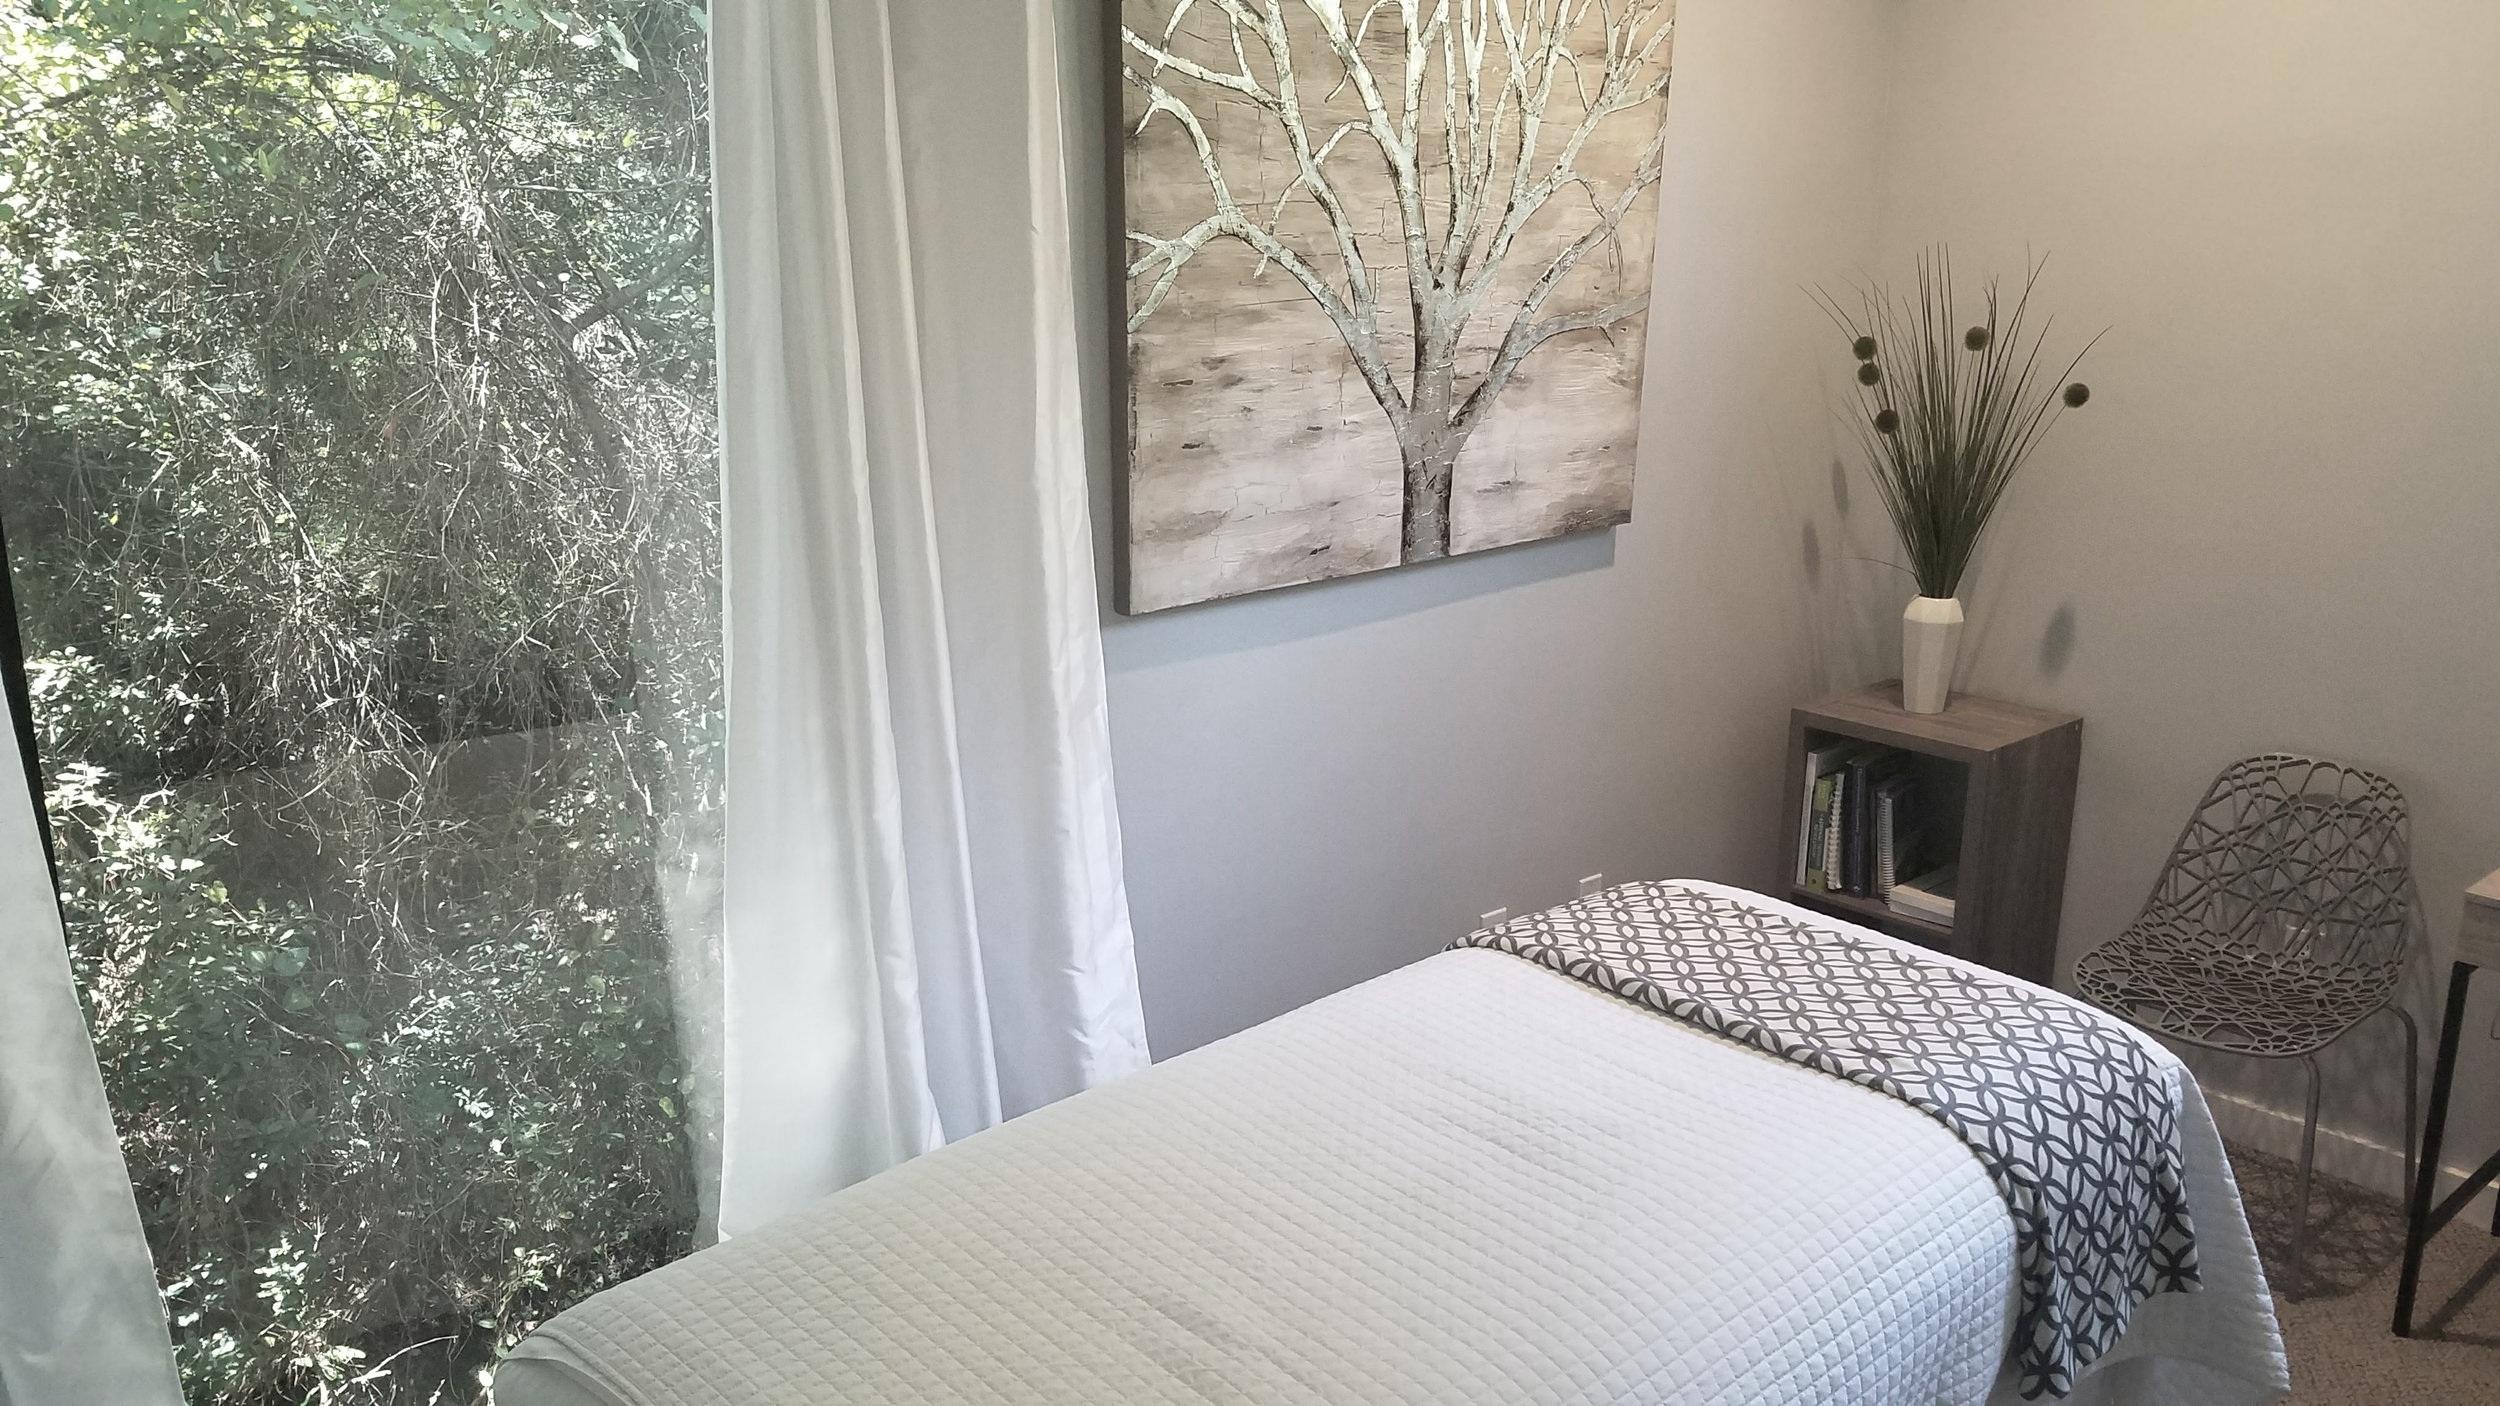 acupuncture and massage room in grayton beach fl